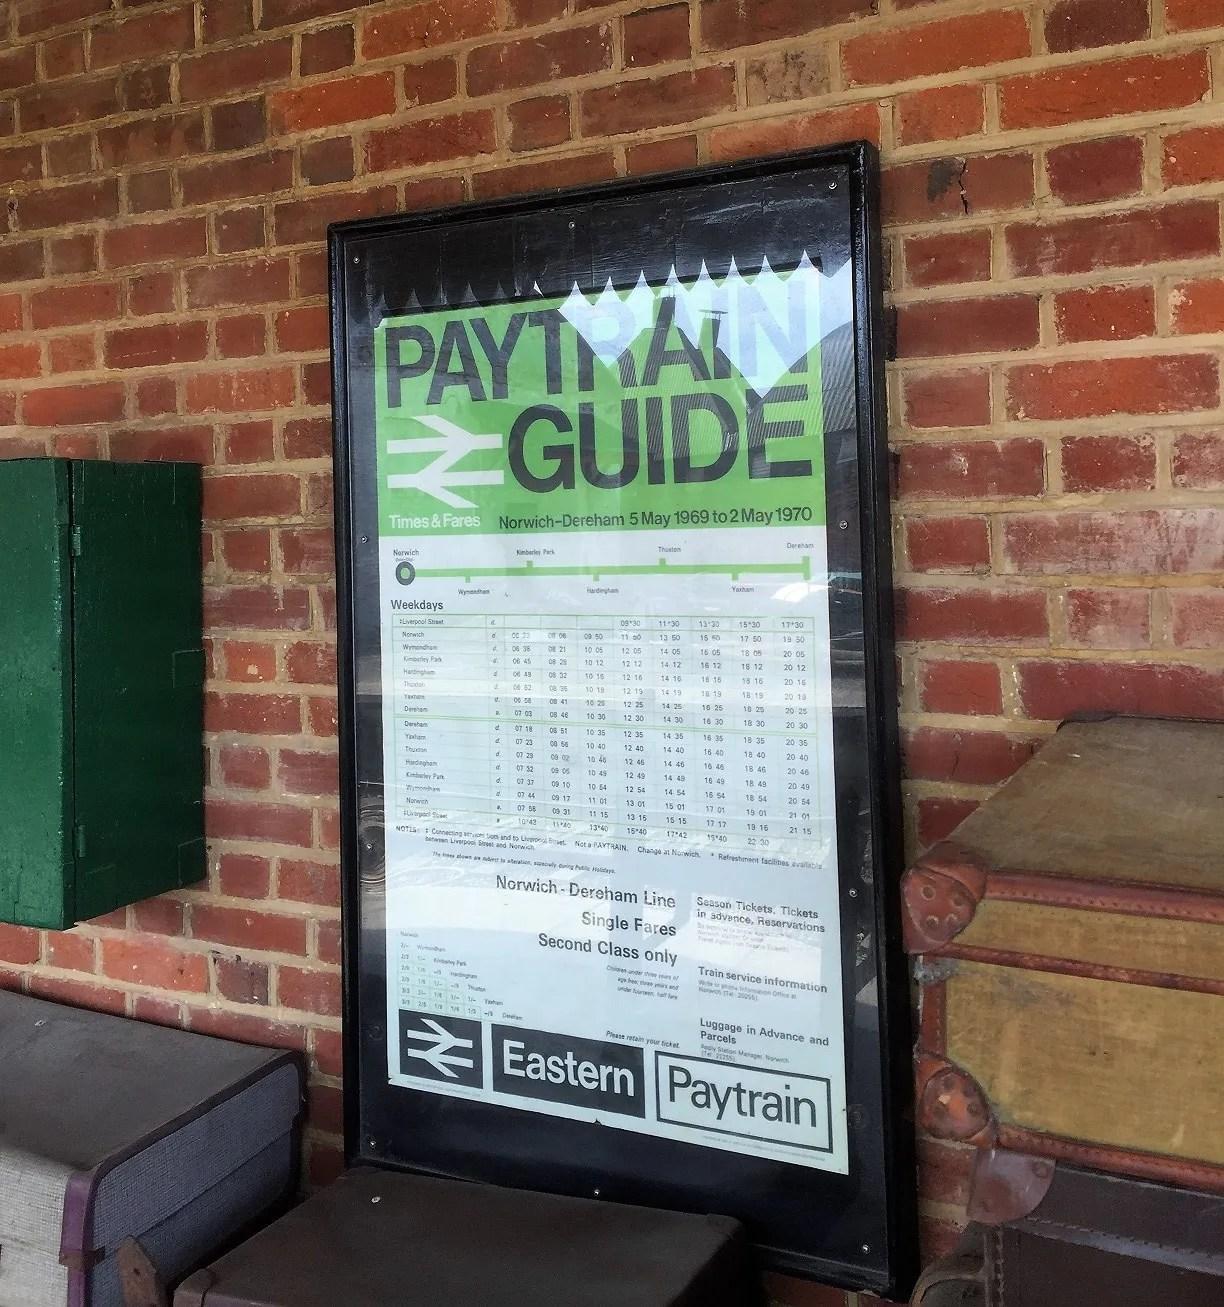 British Railways poster for PayTrain fares.